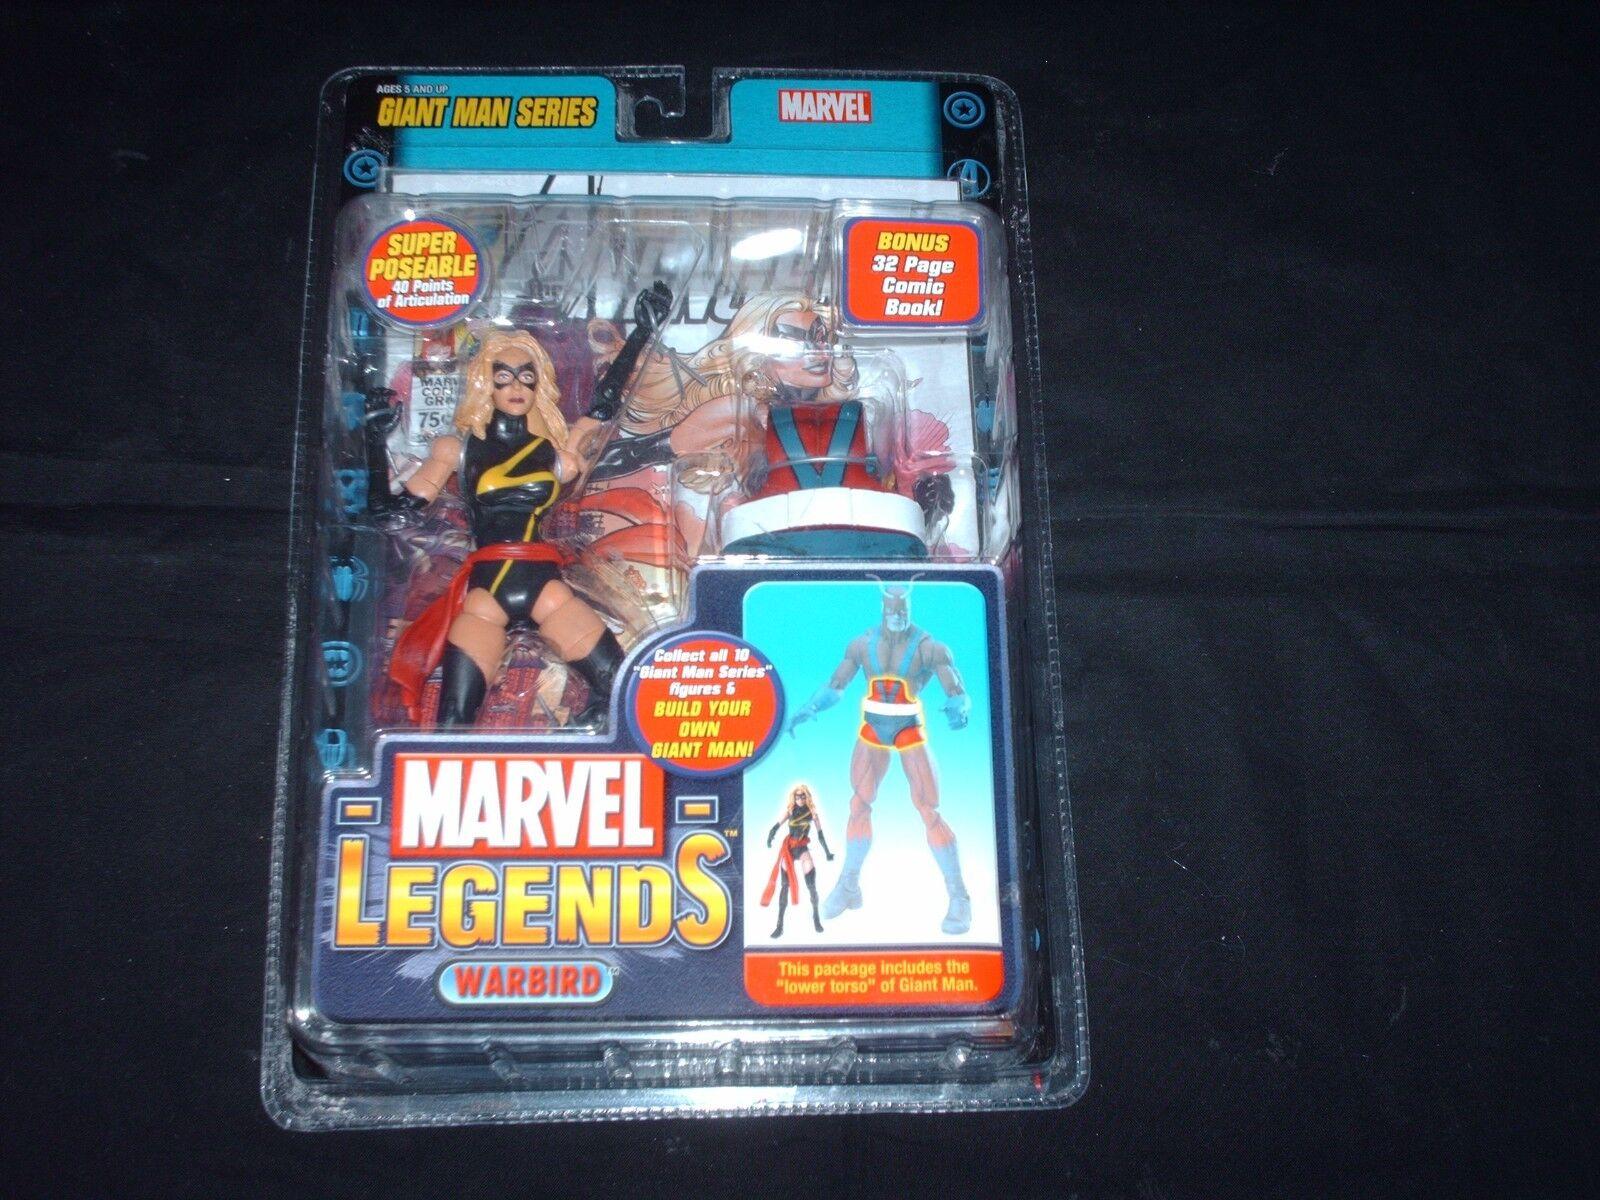 Marvel - legenden 'frau marvel avengers jährlich 10 - neue figur w -